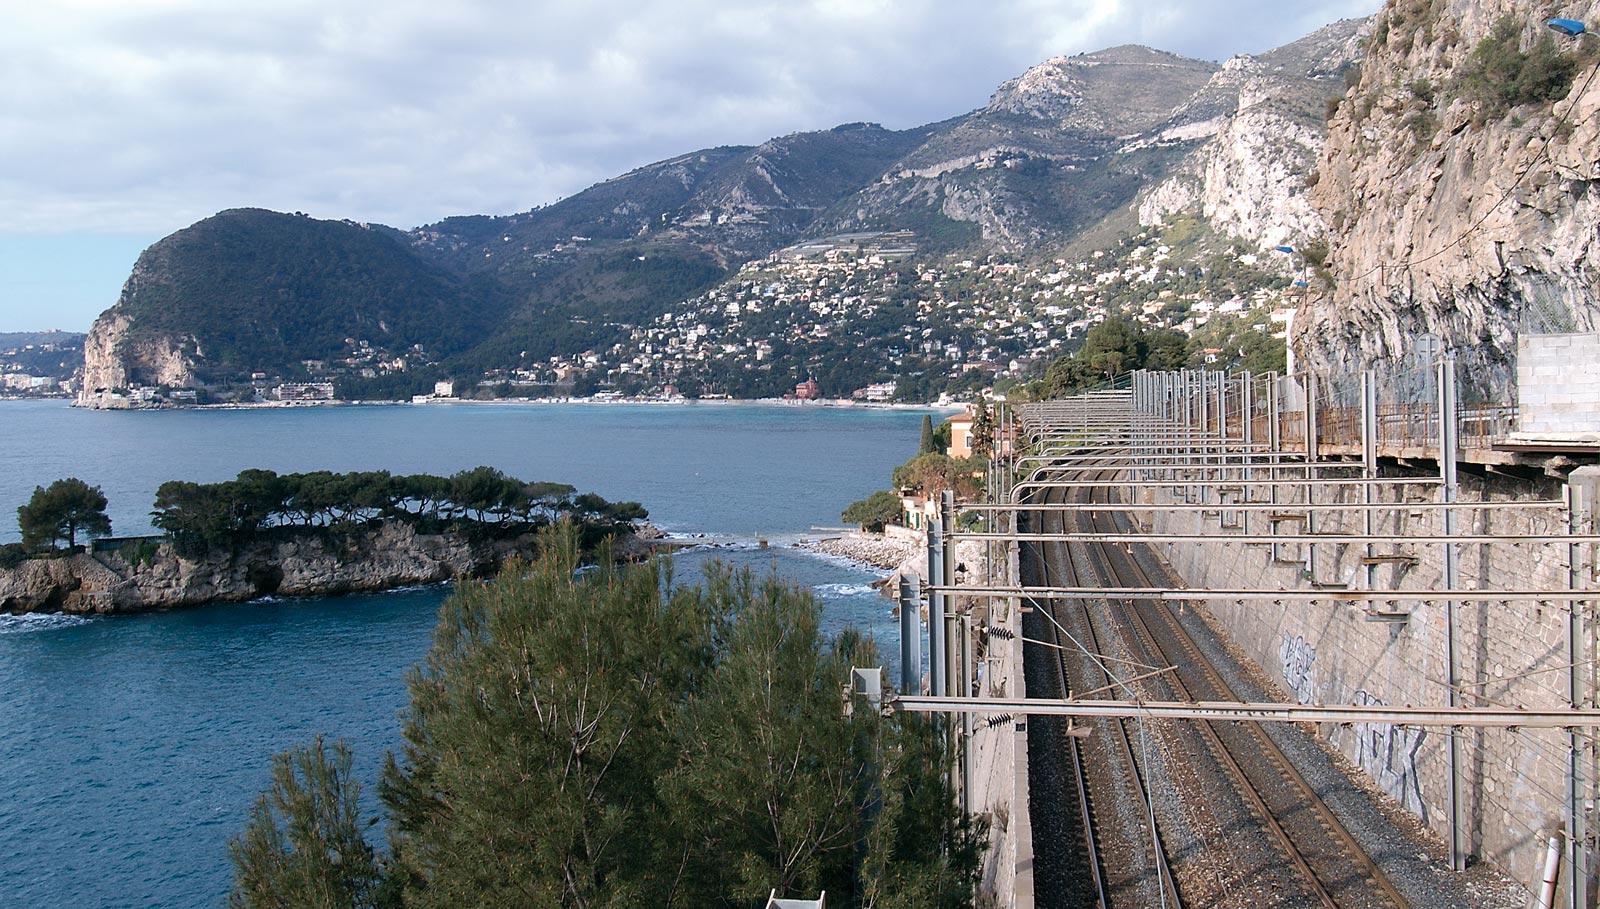 SNCF-Train-LGV-Paca-rff-p01801